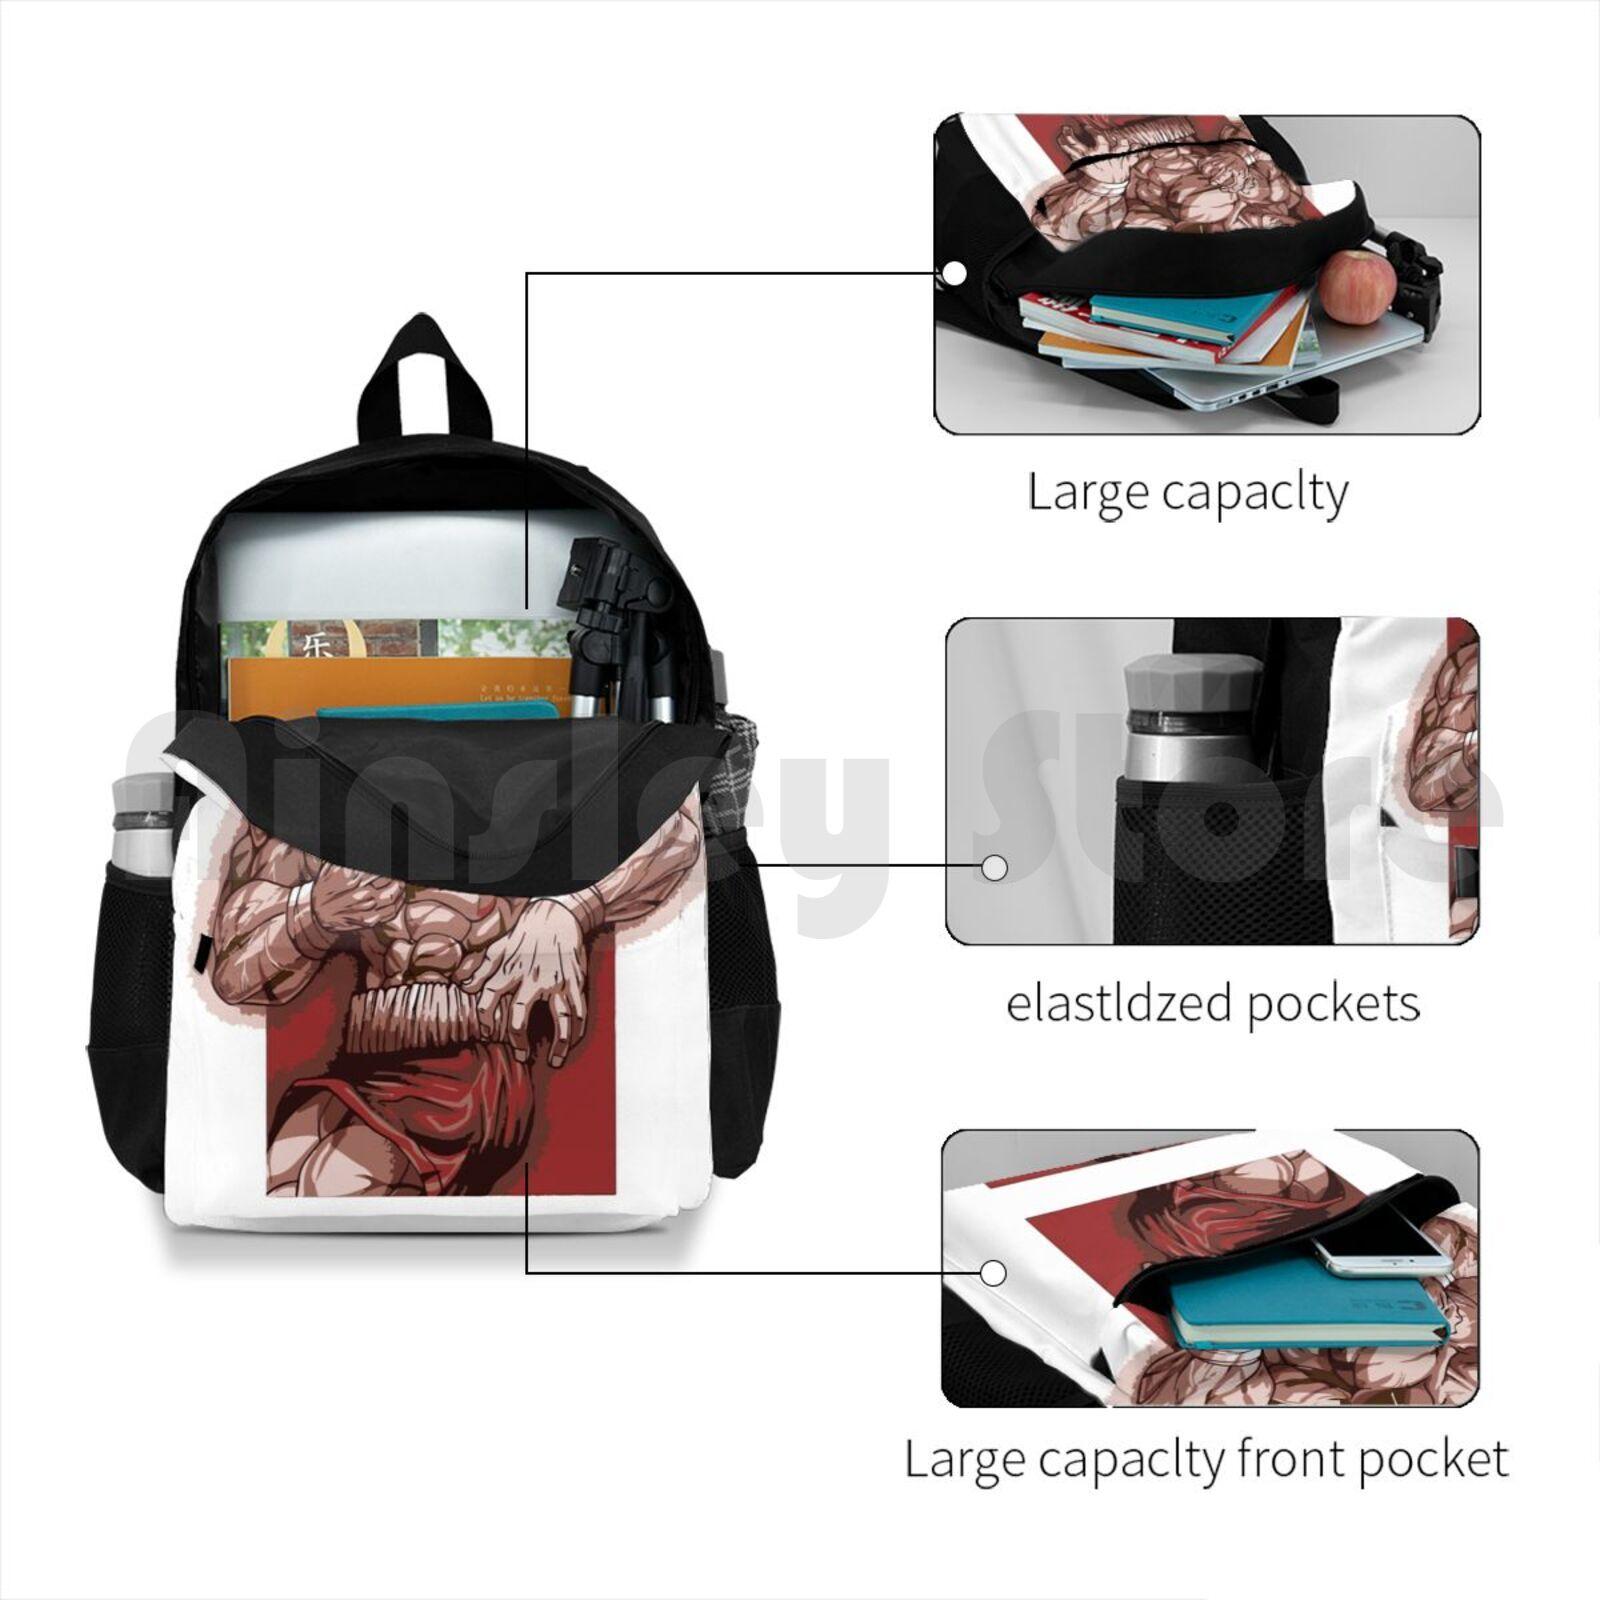 Hf79020fba2544dc490b3f3c9f89f82f39 - Anime Backpacks